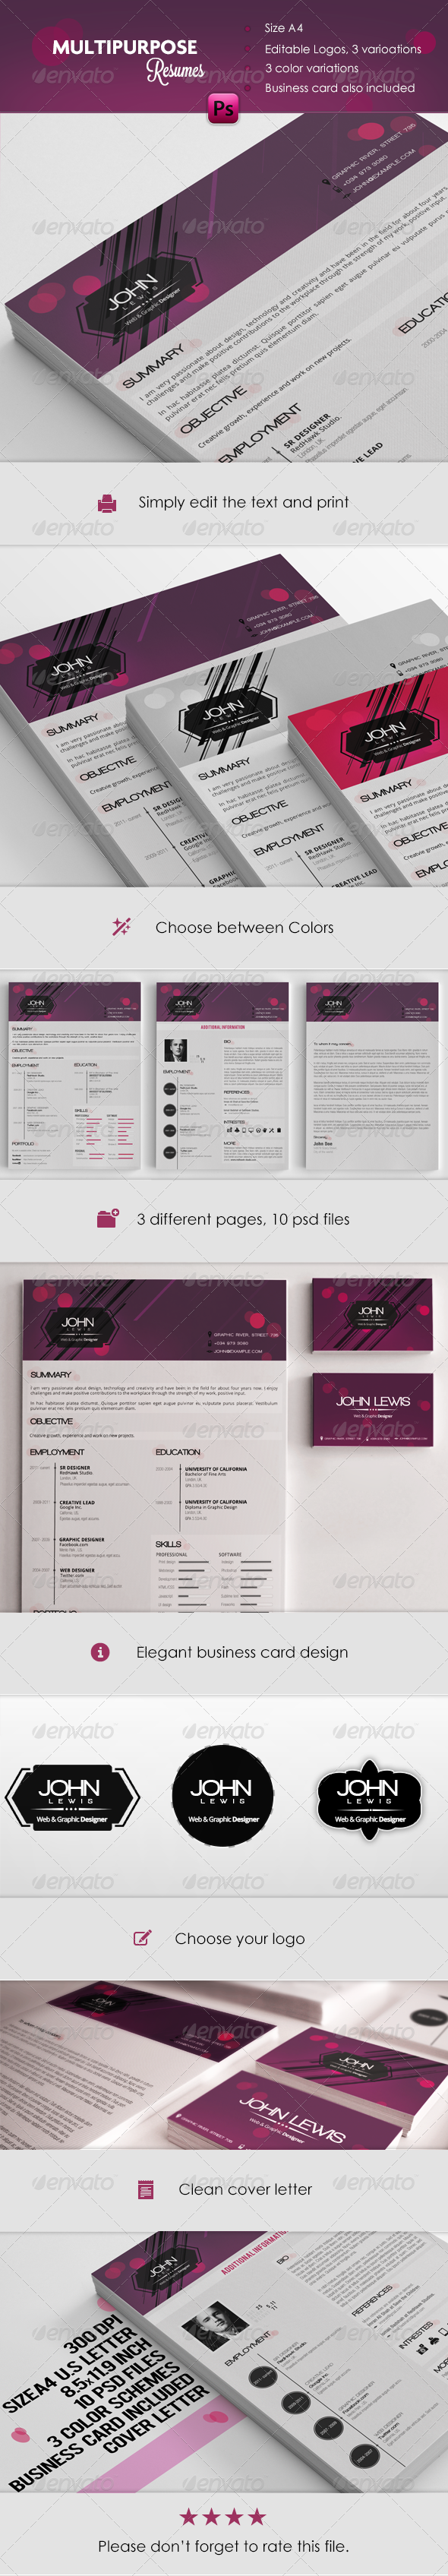 GraphicRiver Multipurpose Resume & Cover Letters 5175558